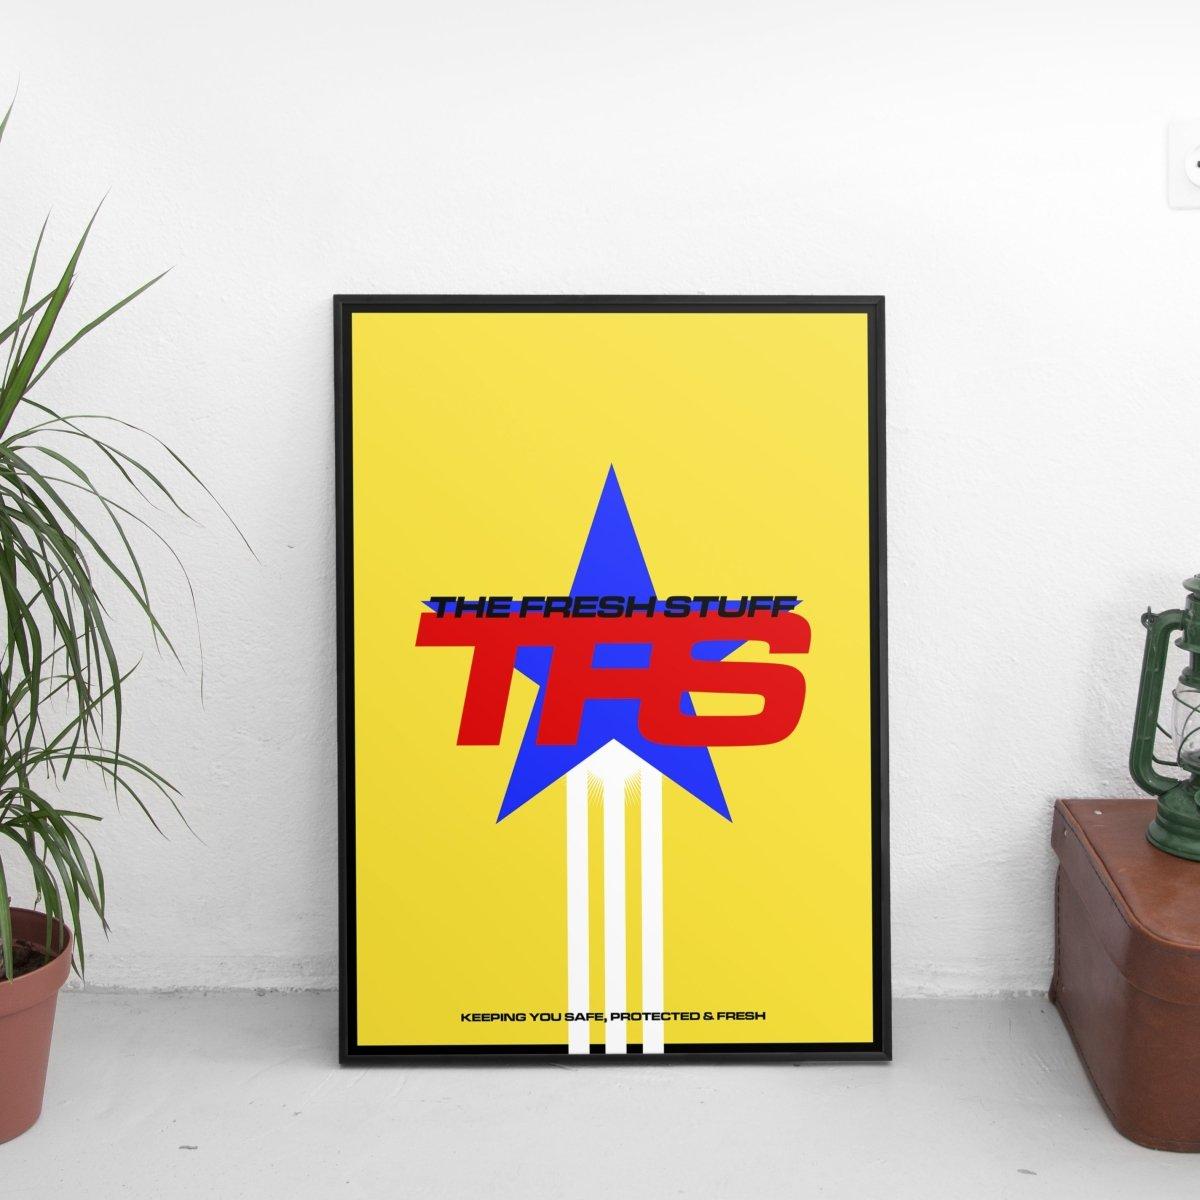 TFS - Keeping You Safe Alternative Poster